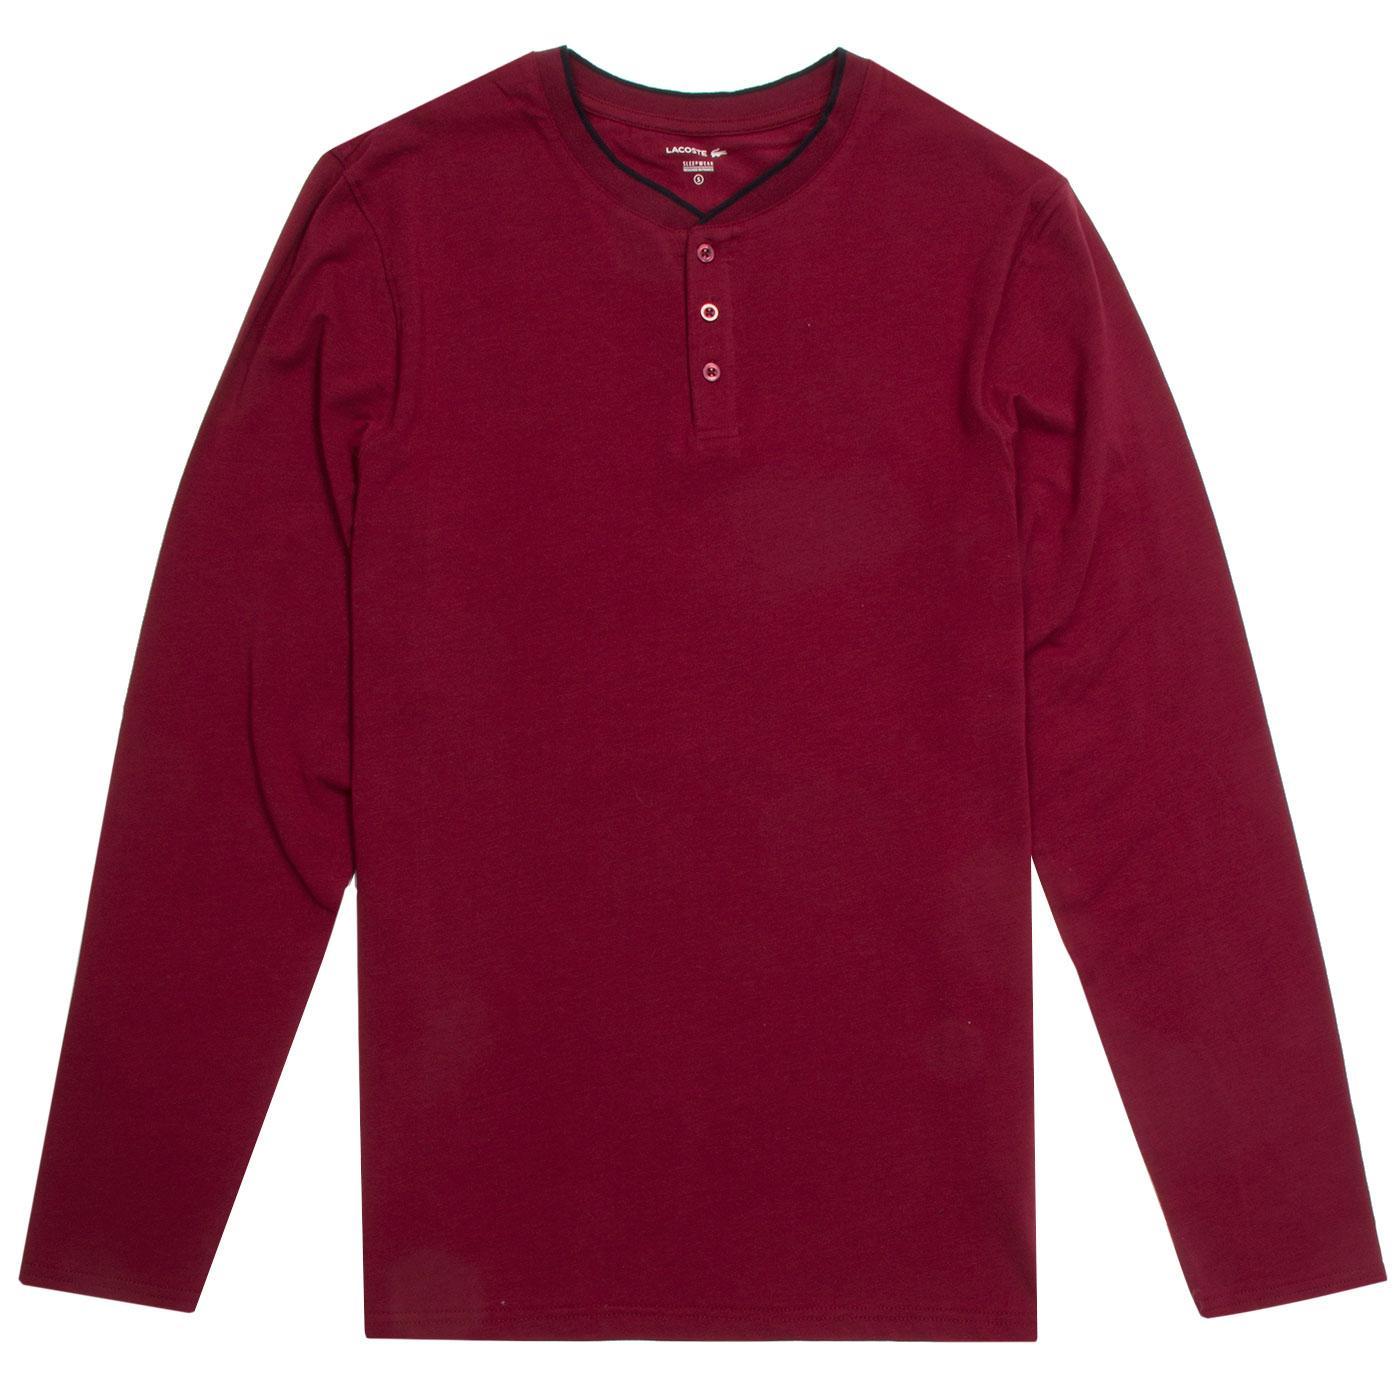 LACOSTE Retro Henley Collar Loungewear Tee DR